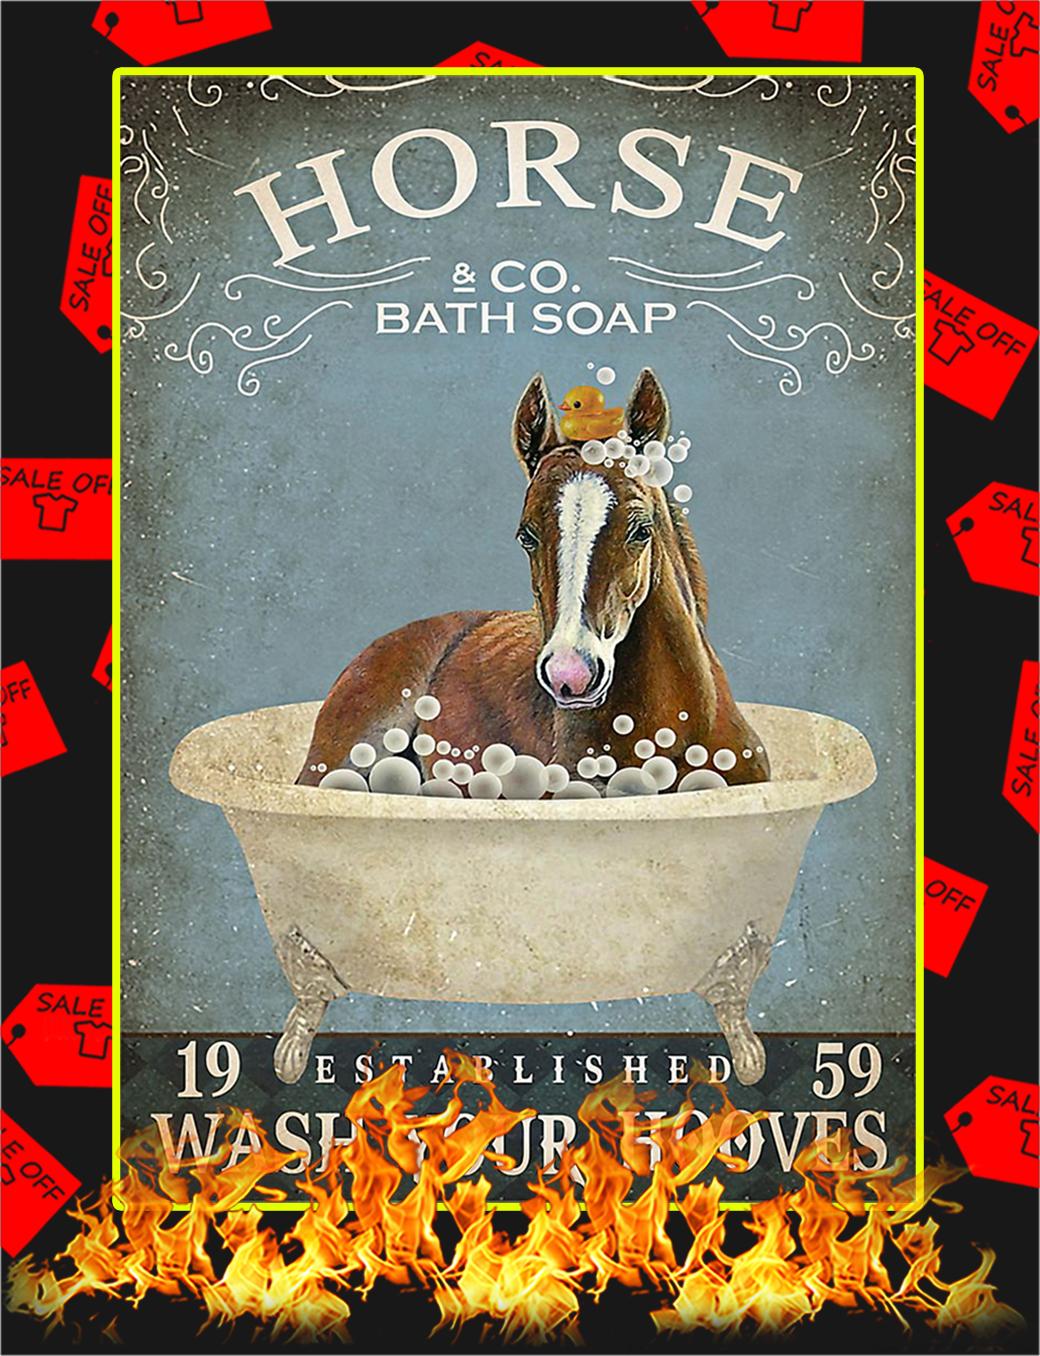 Bath soap company horse poster - A2